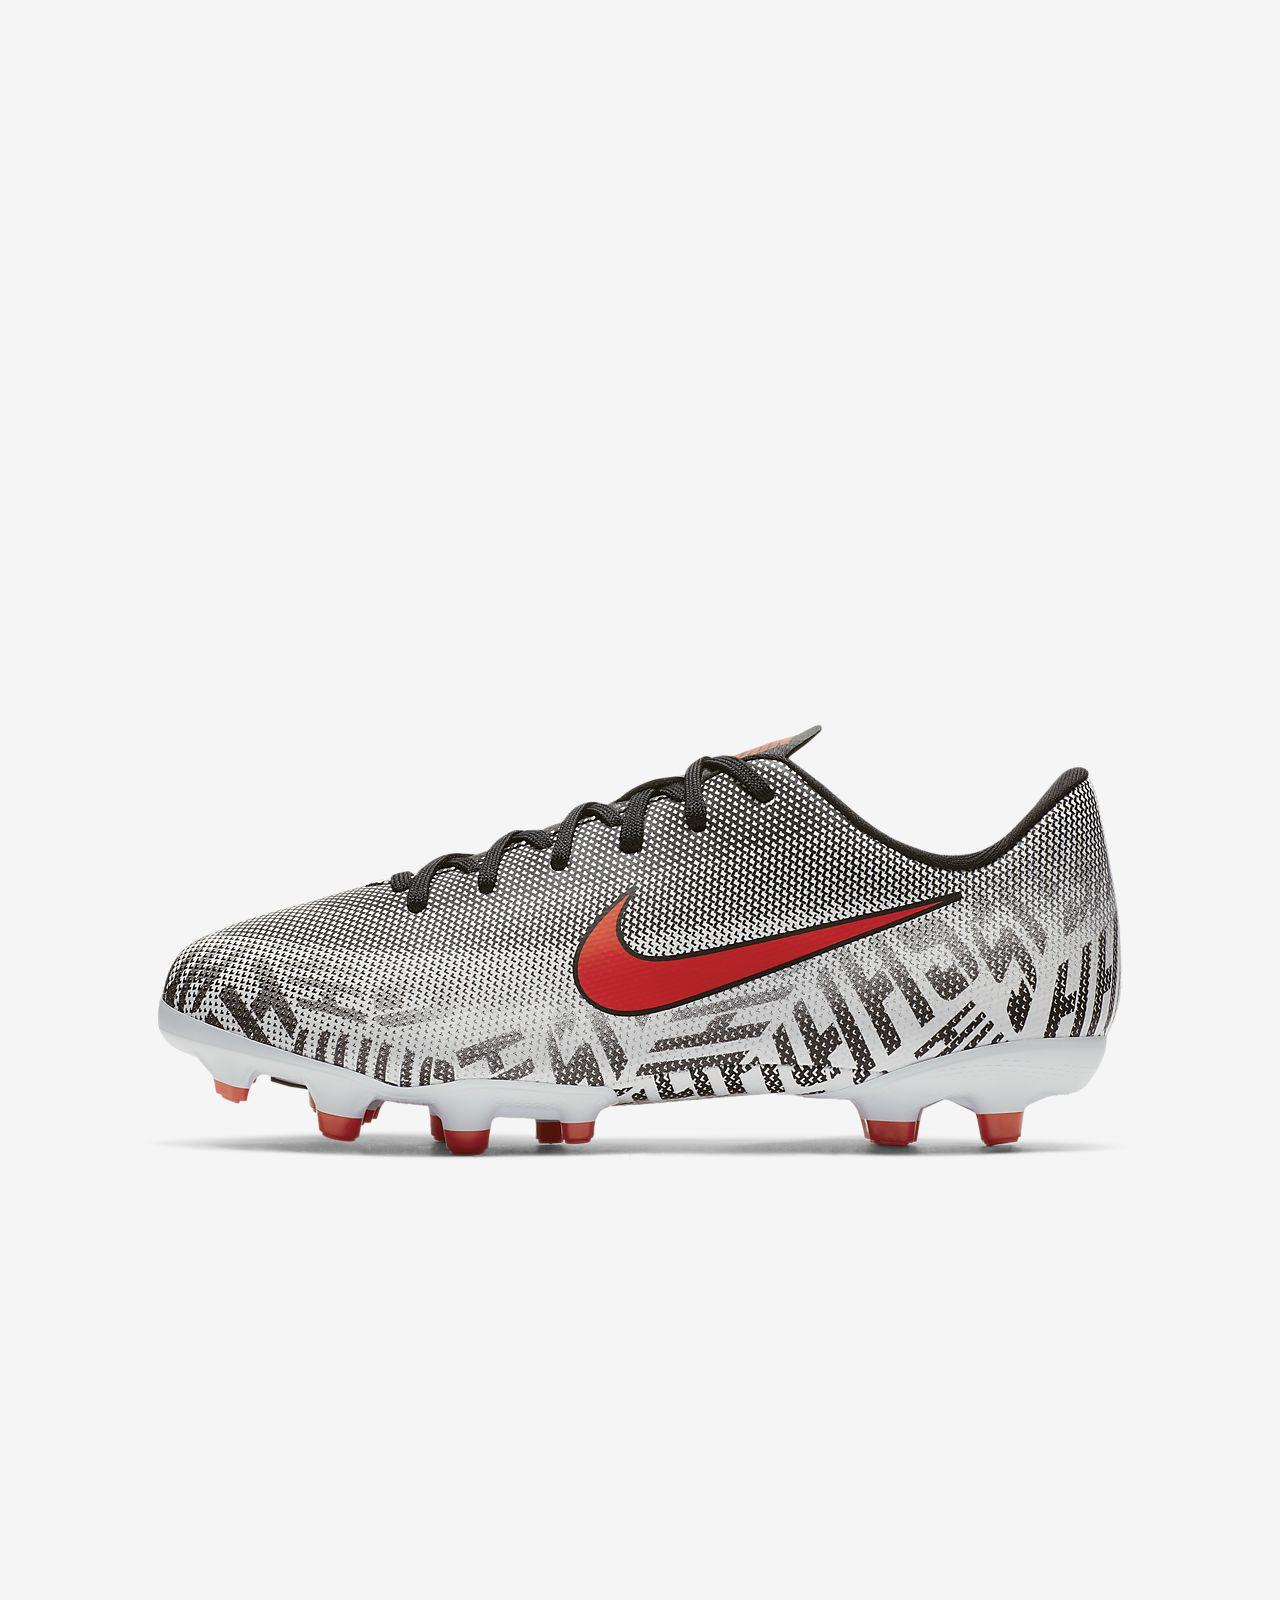 ... Scarpa da calcio multiterreno Nike Jr. Mercurial Vapor XII Academy  Neymar Jr - Bambini  cc6bce2c8af